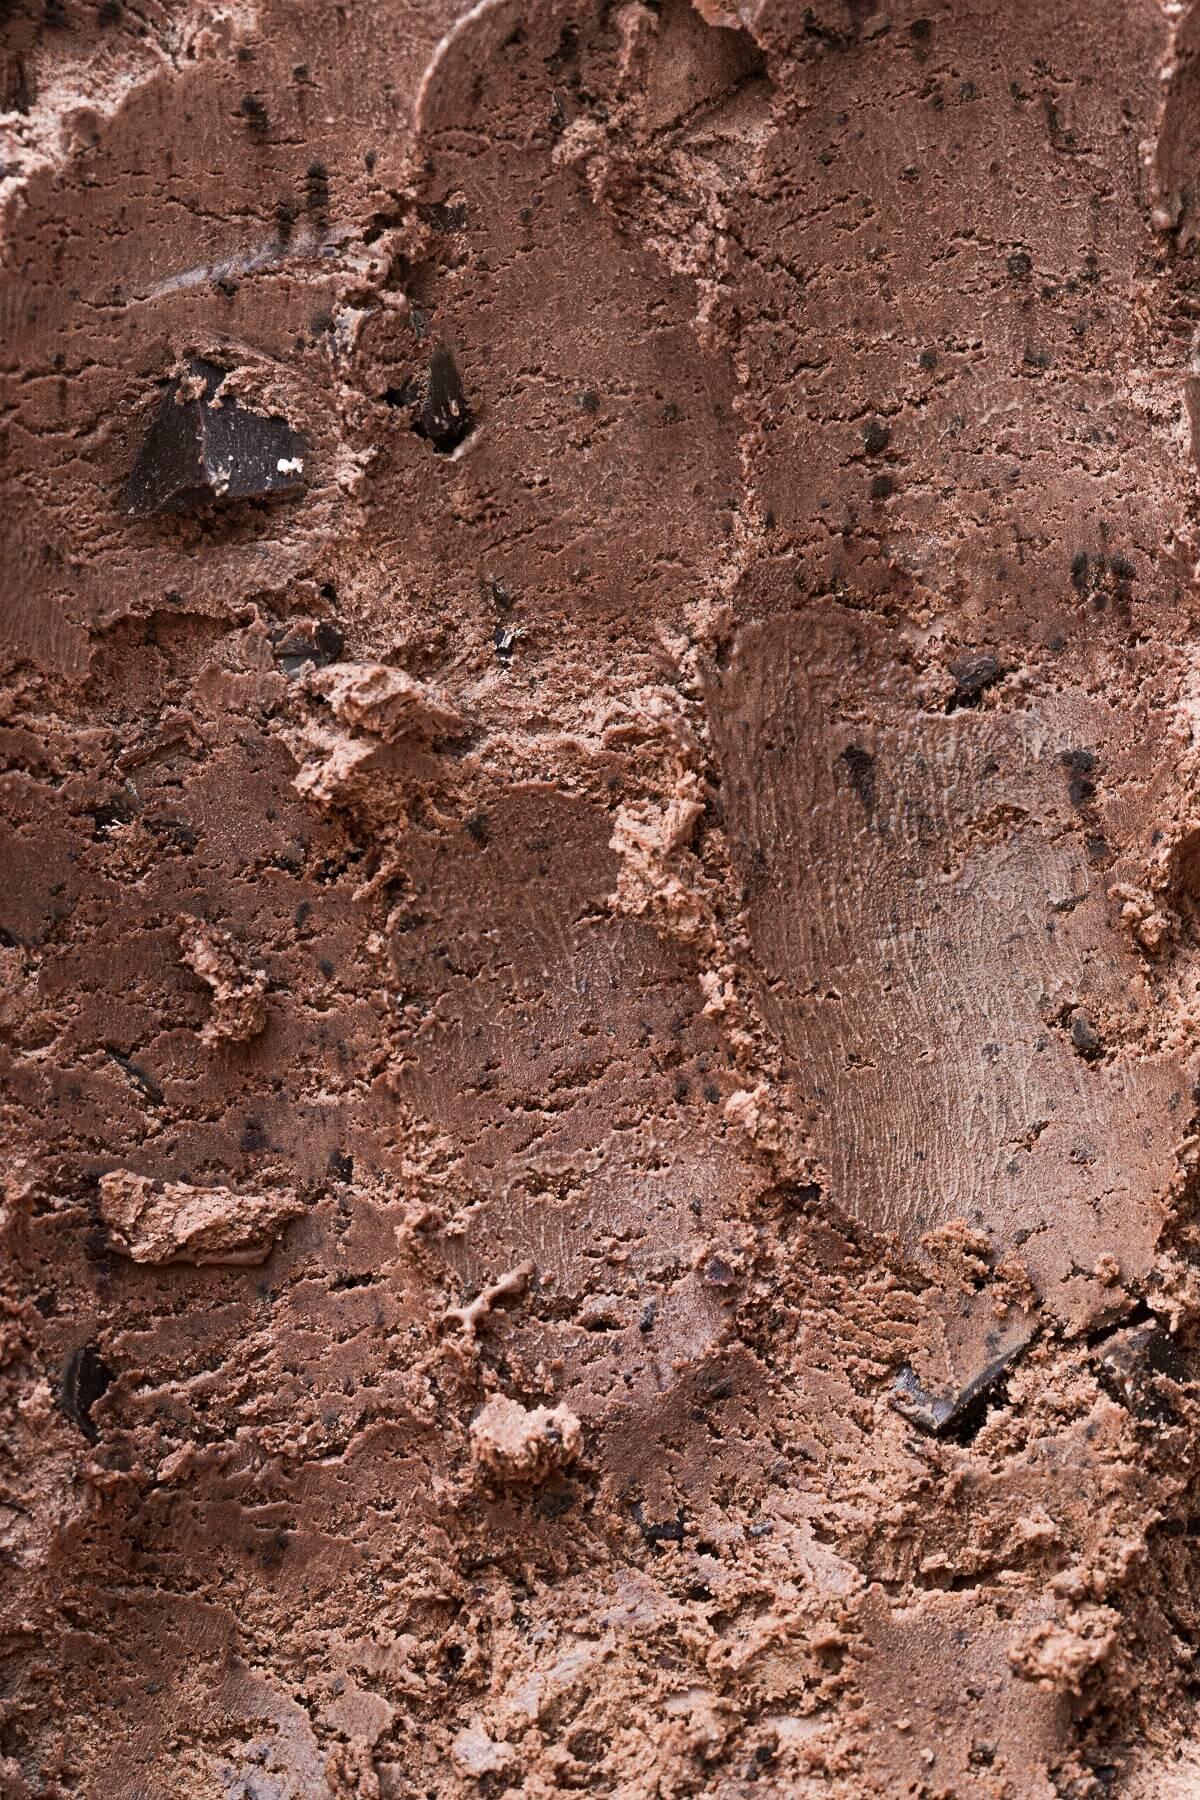 Closeup of no churn triple chocolate ice cream.